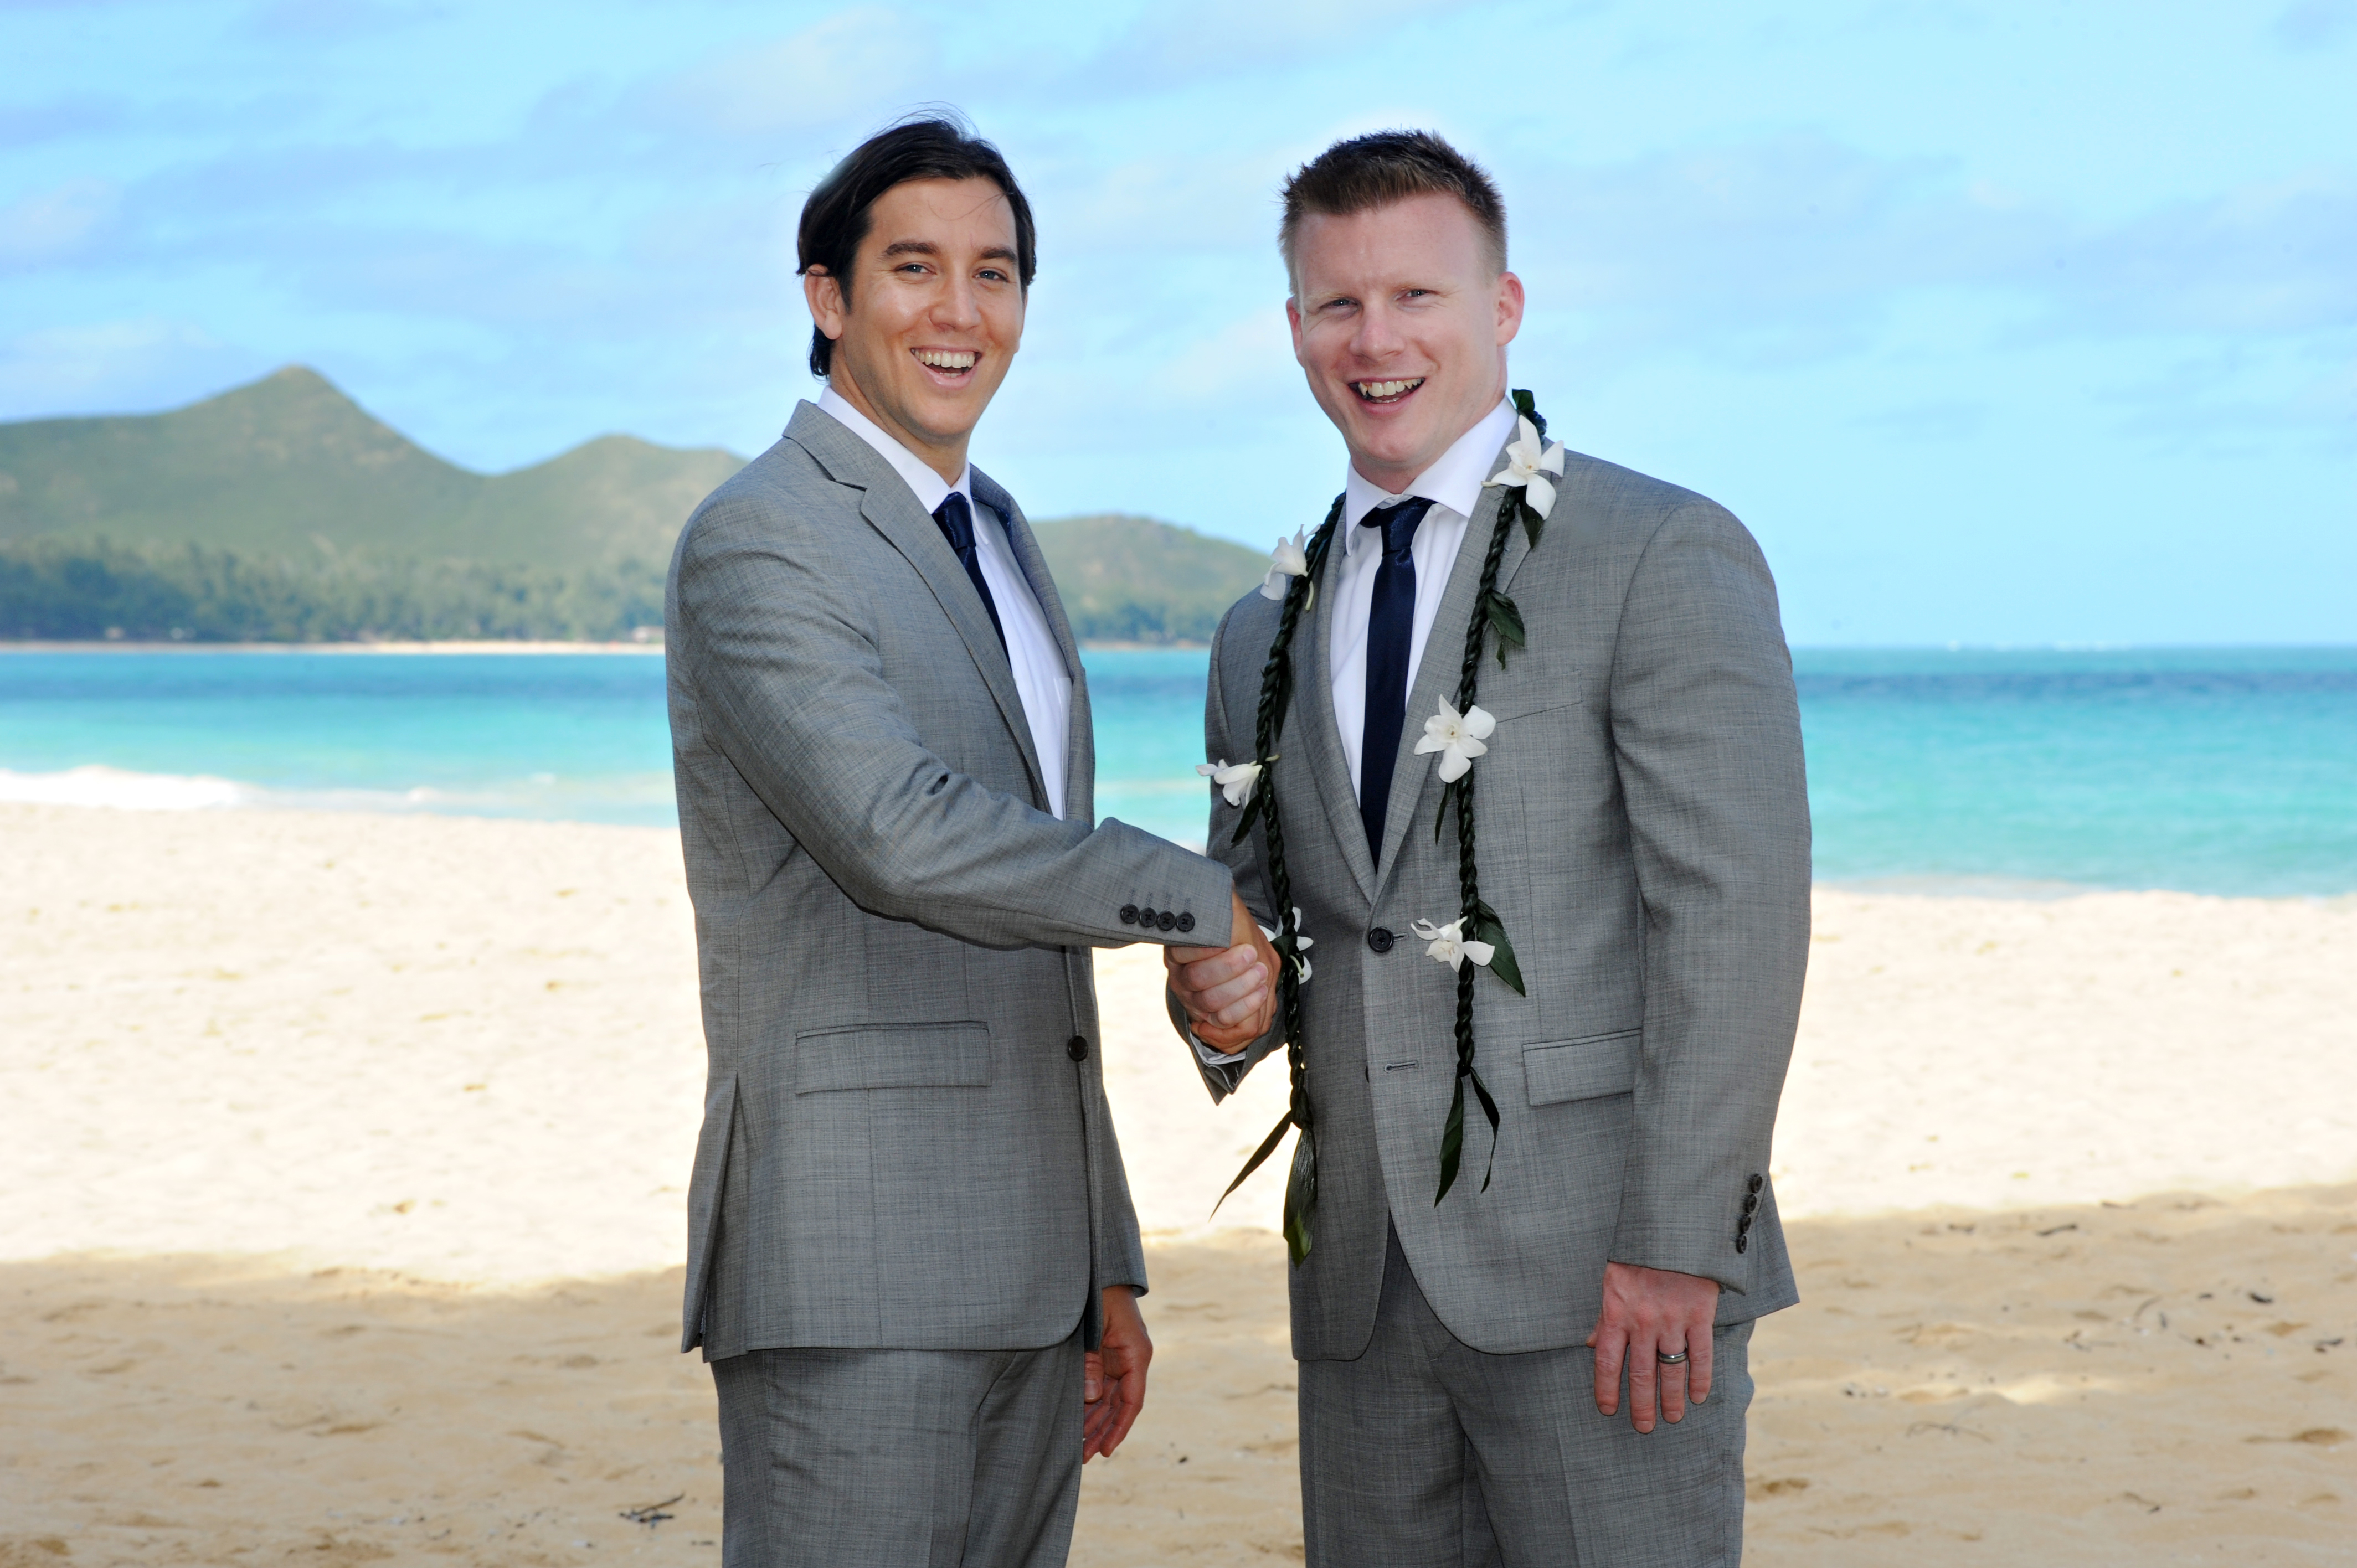 wedding In Hawaii -Bride -maids-6